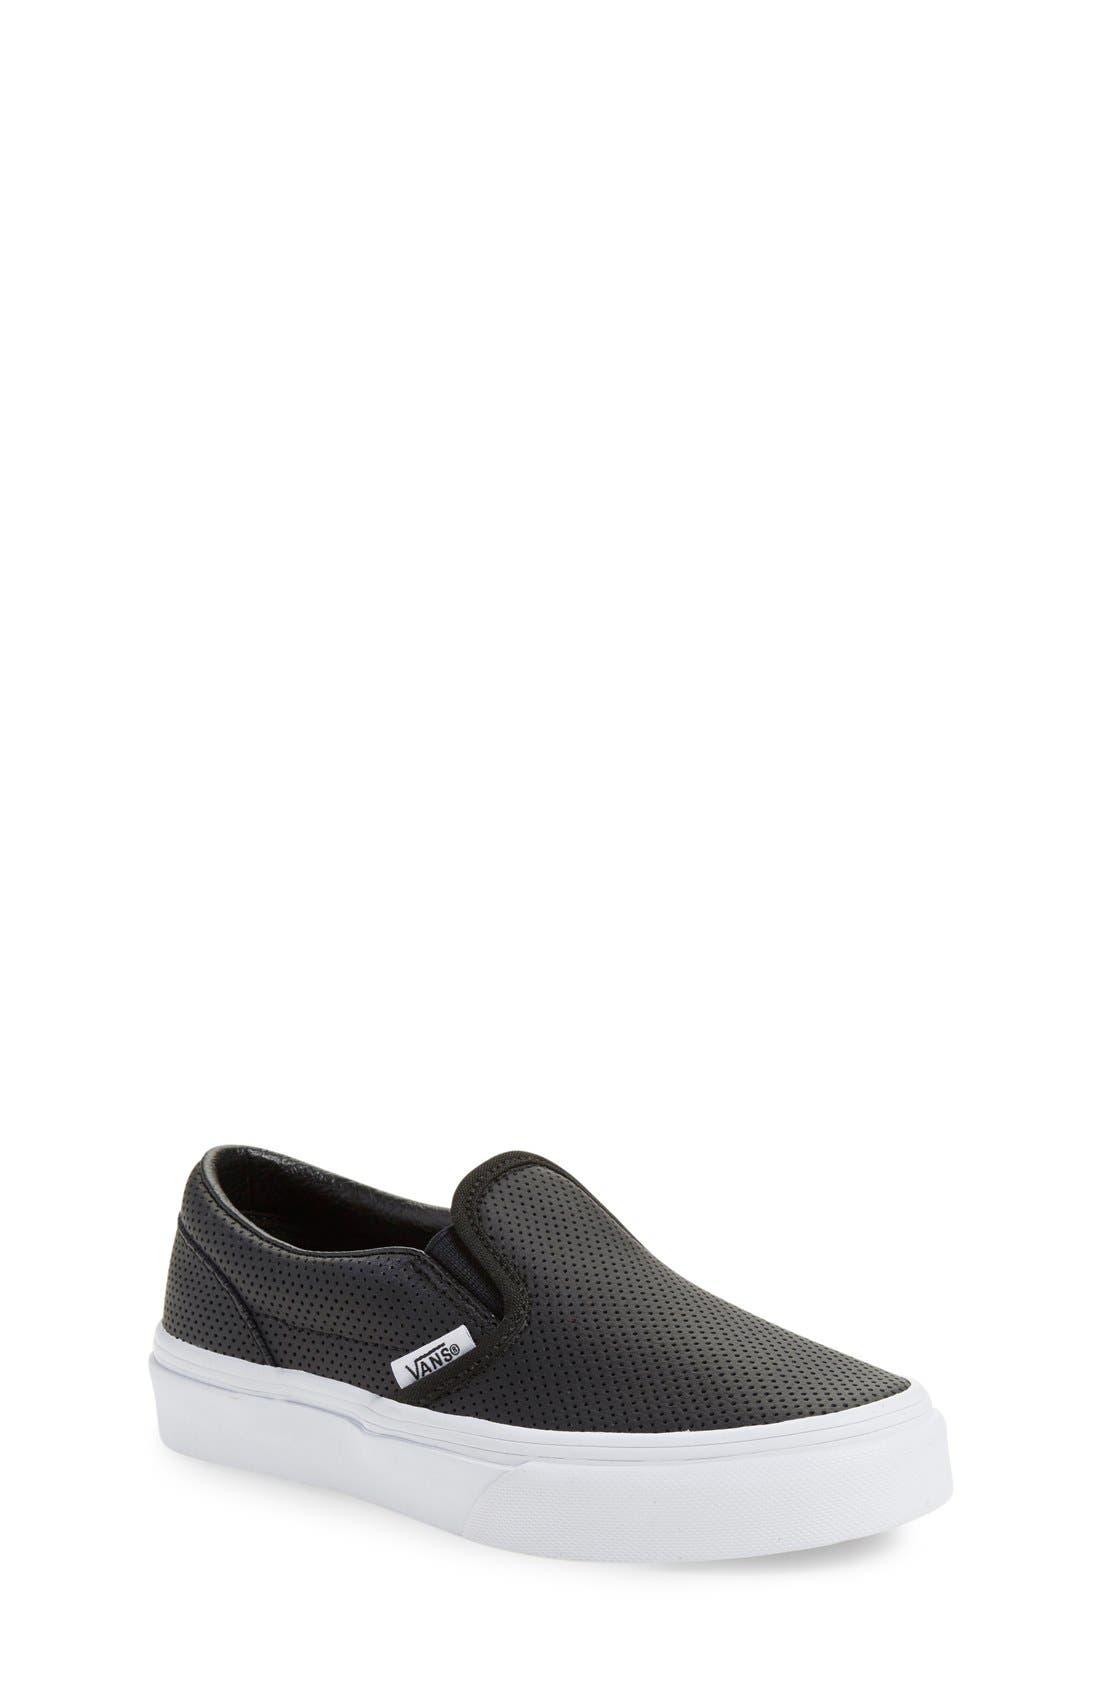 VANS, 'Classic' Slip-On Sneaker, Main thumbnail 1, color, BLACK LEATHER